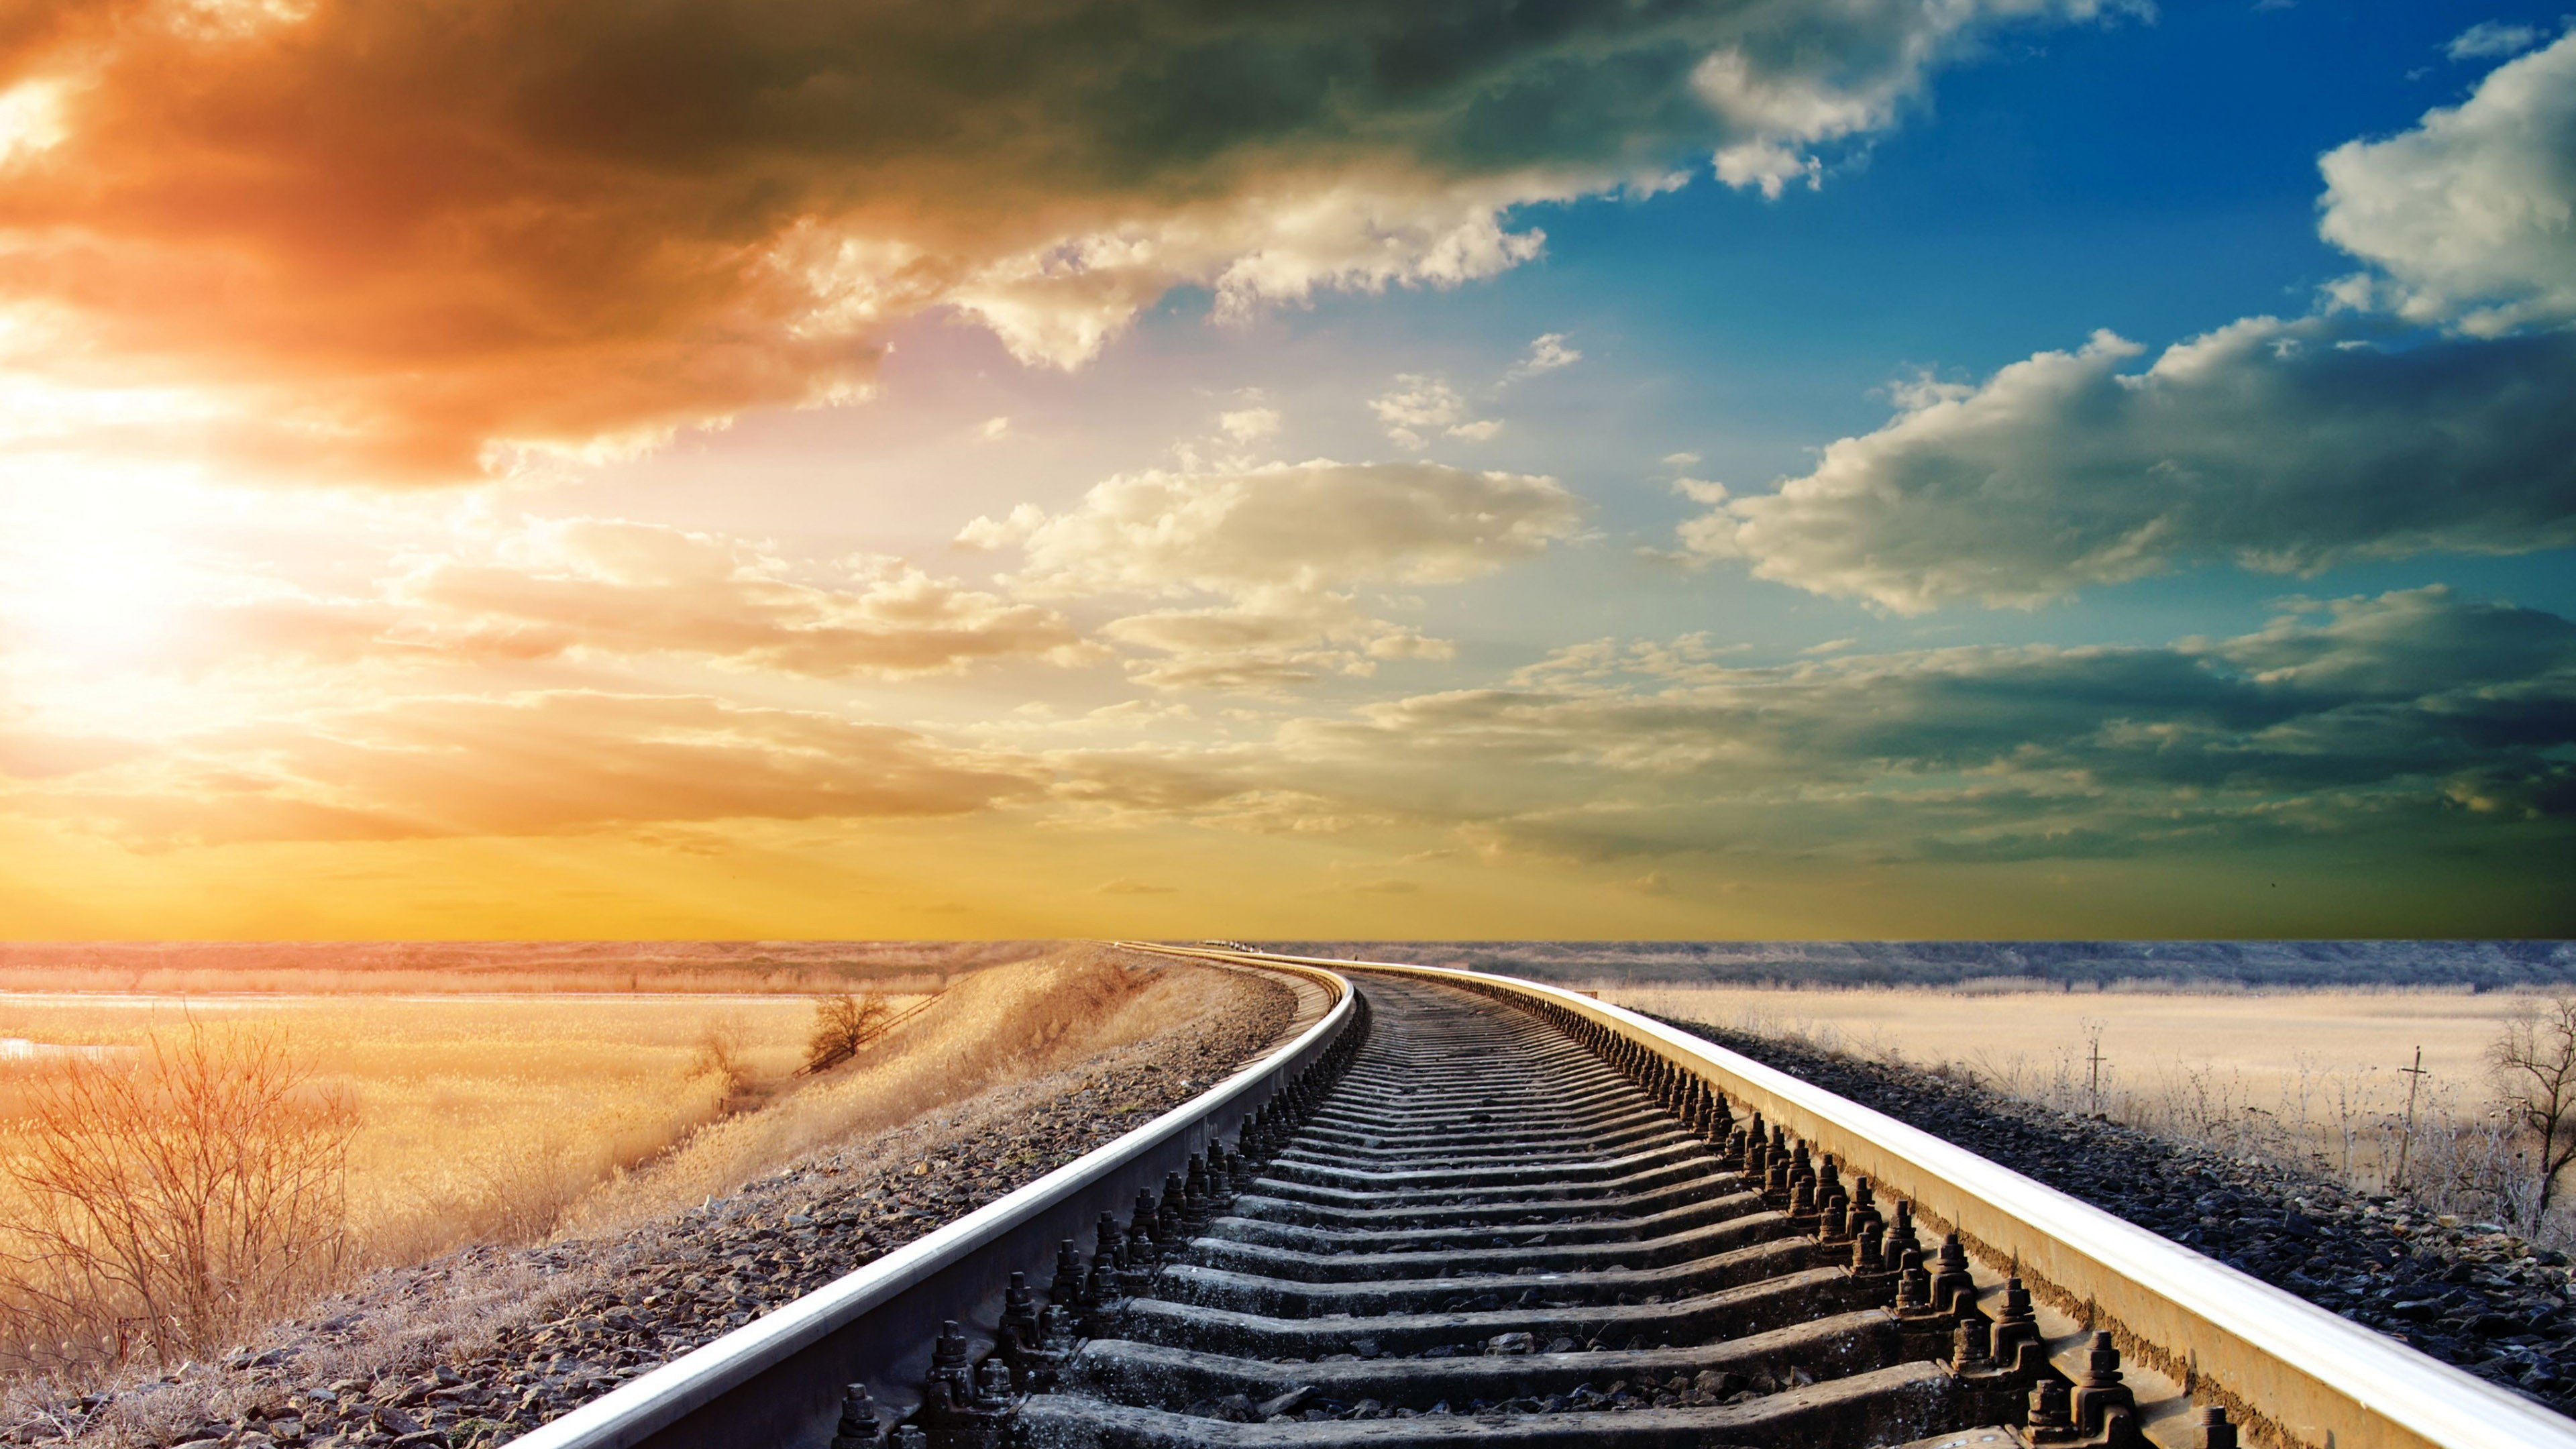 Wallpaper Railway 4k Hd Wallpaper Road Sky Clouds Day